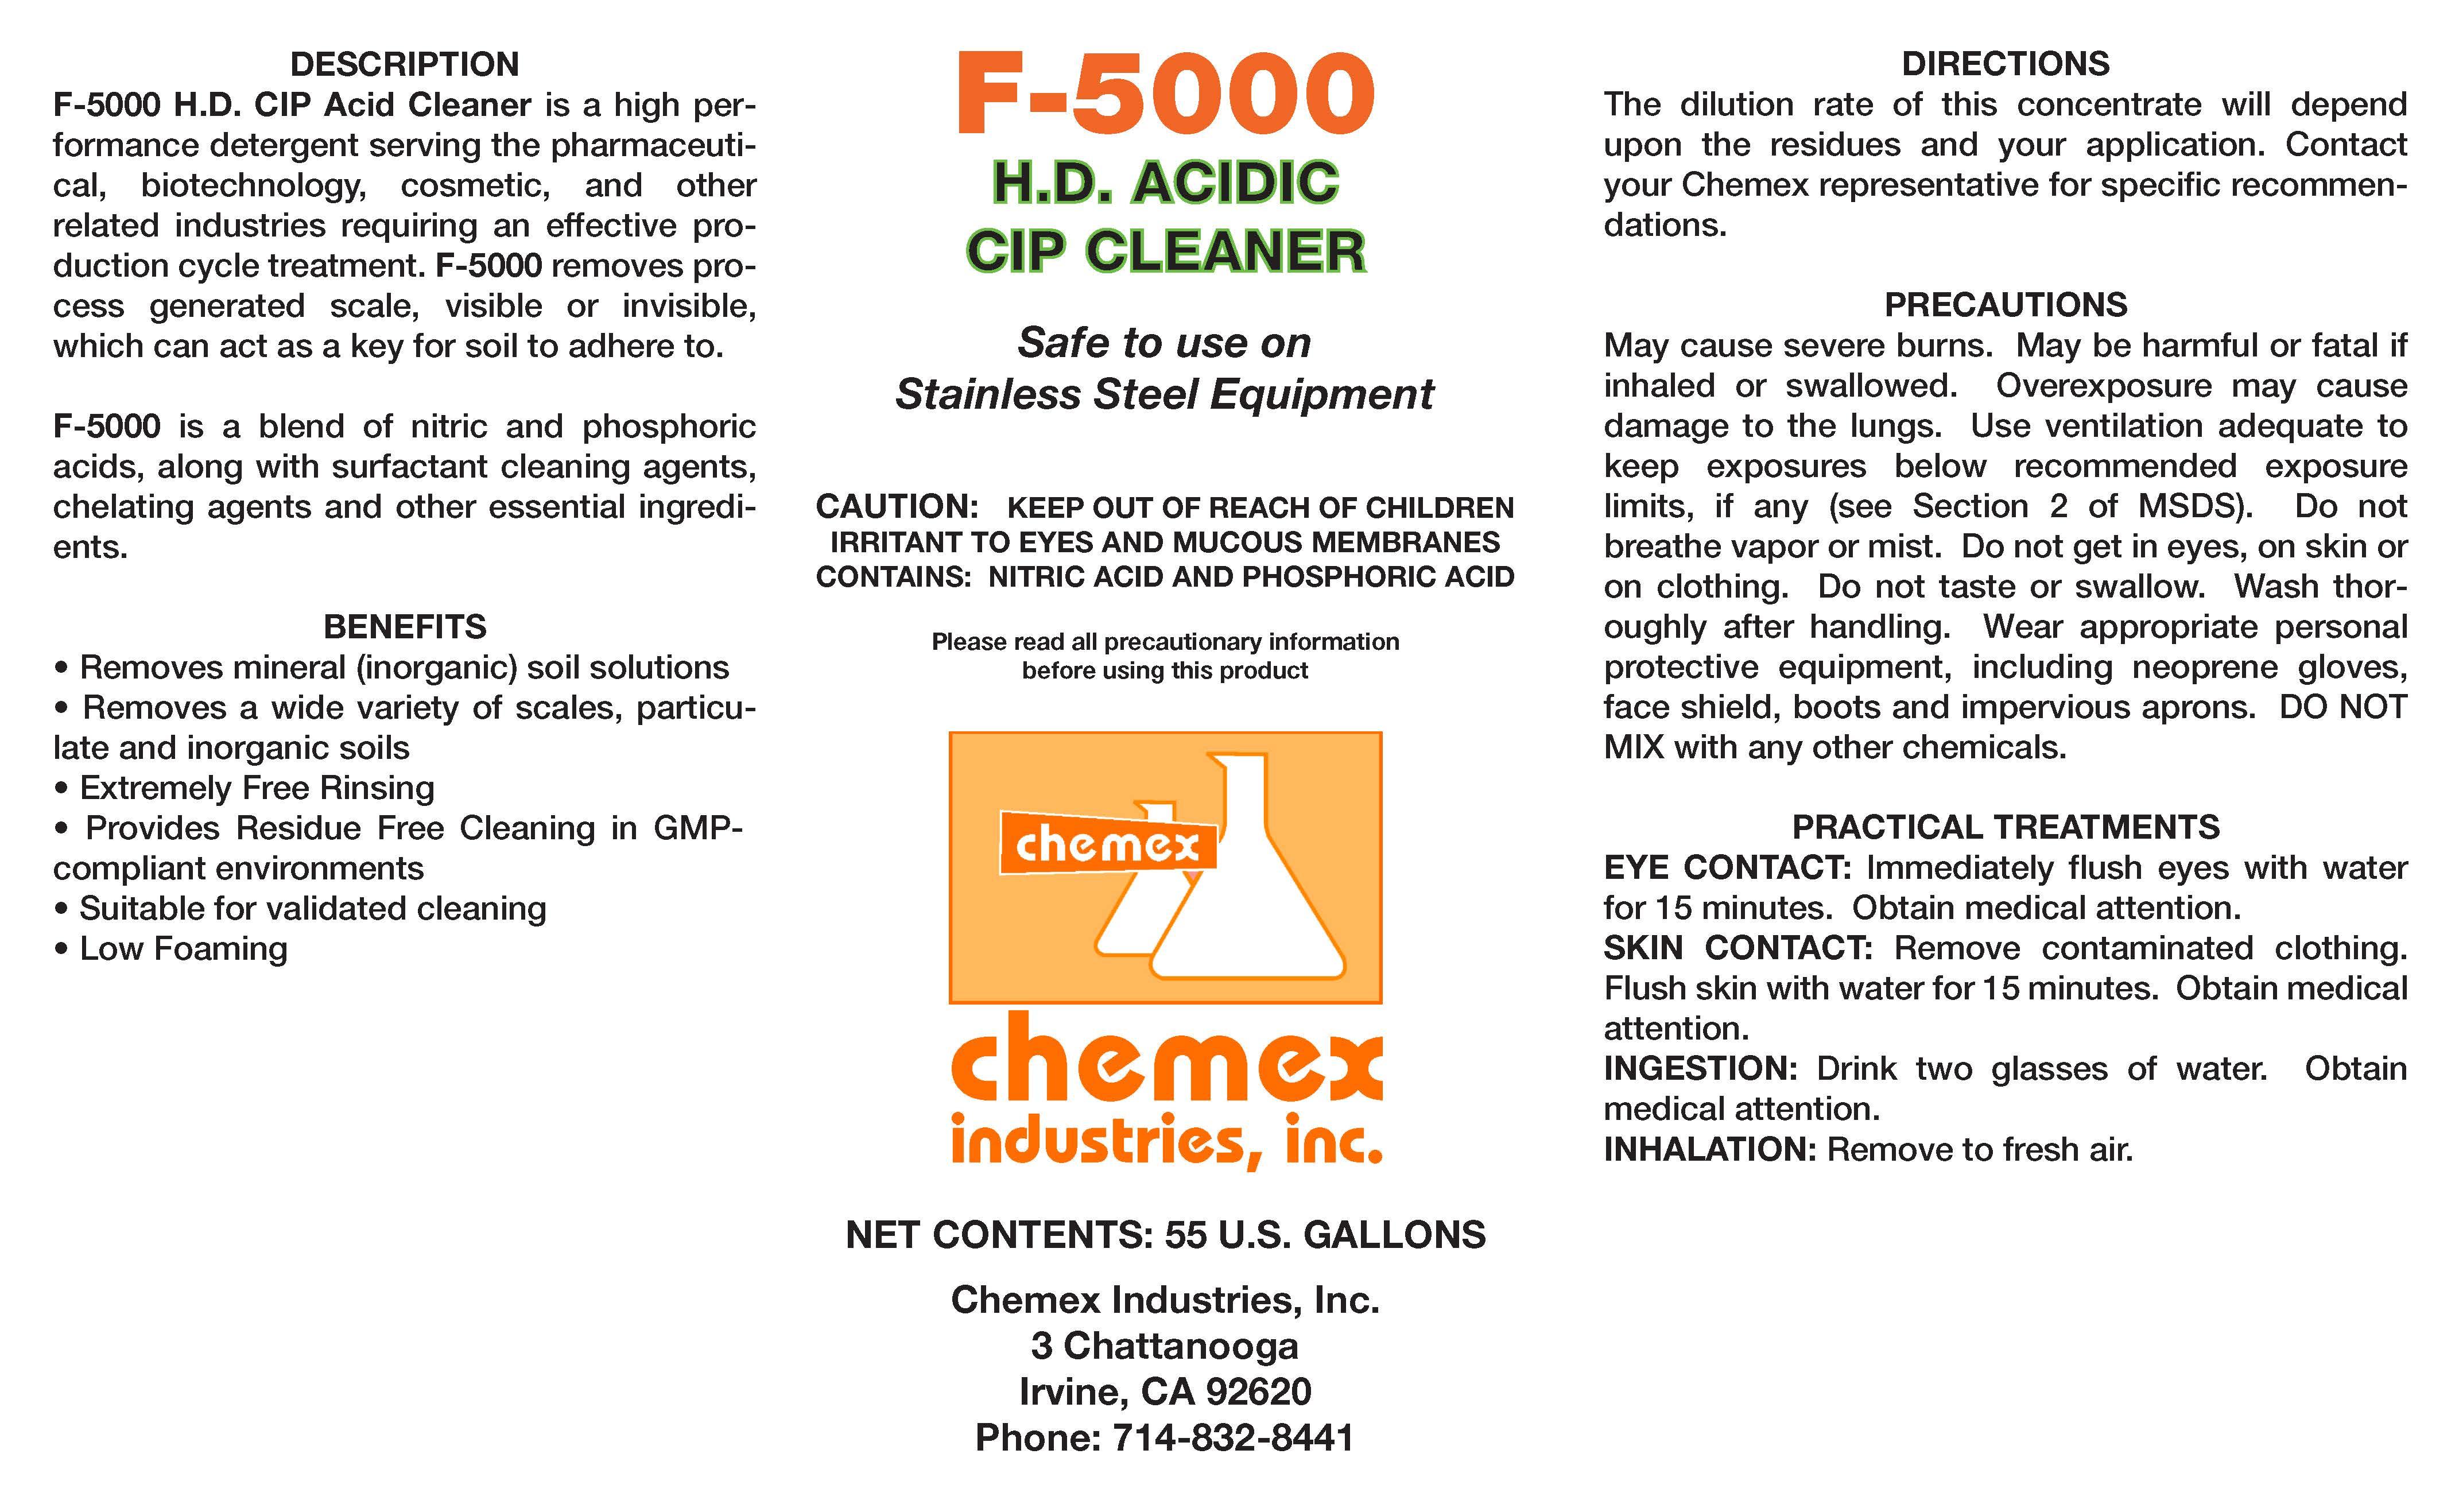 F-5000.CIP_Cleaner